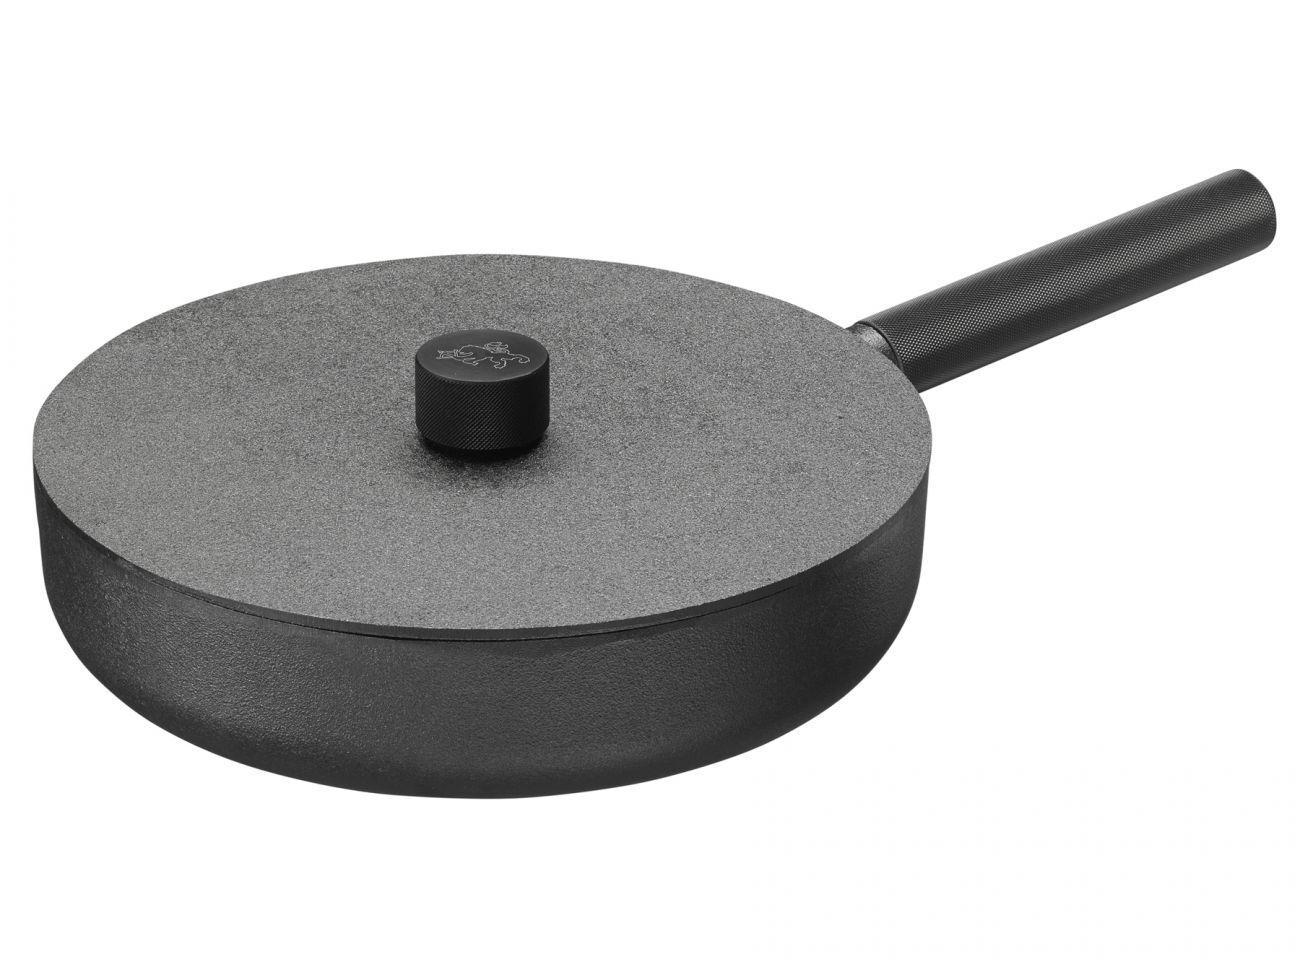 Skeppshult Noir schlemmerpfanne Poêle ofenpfanne en fonte avec couvercle 28 cm